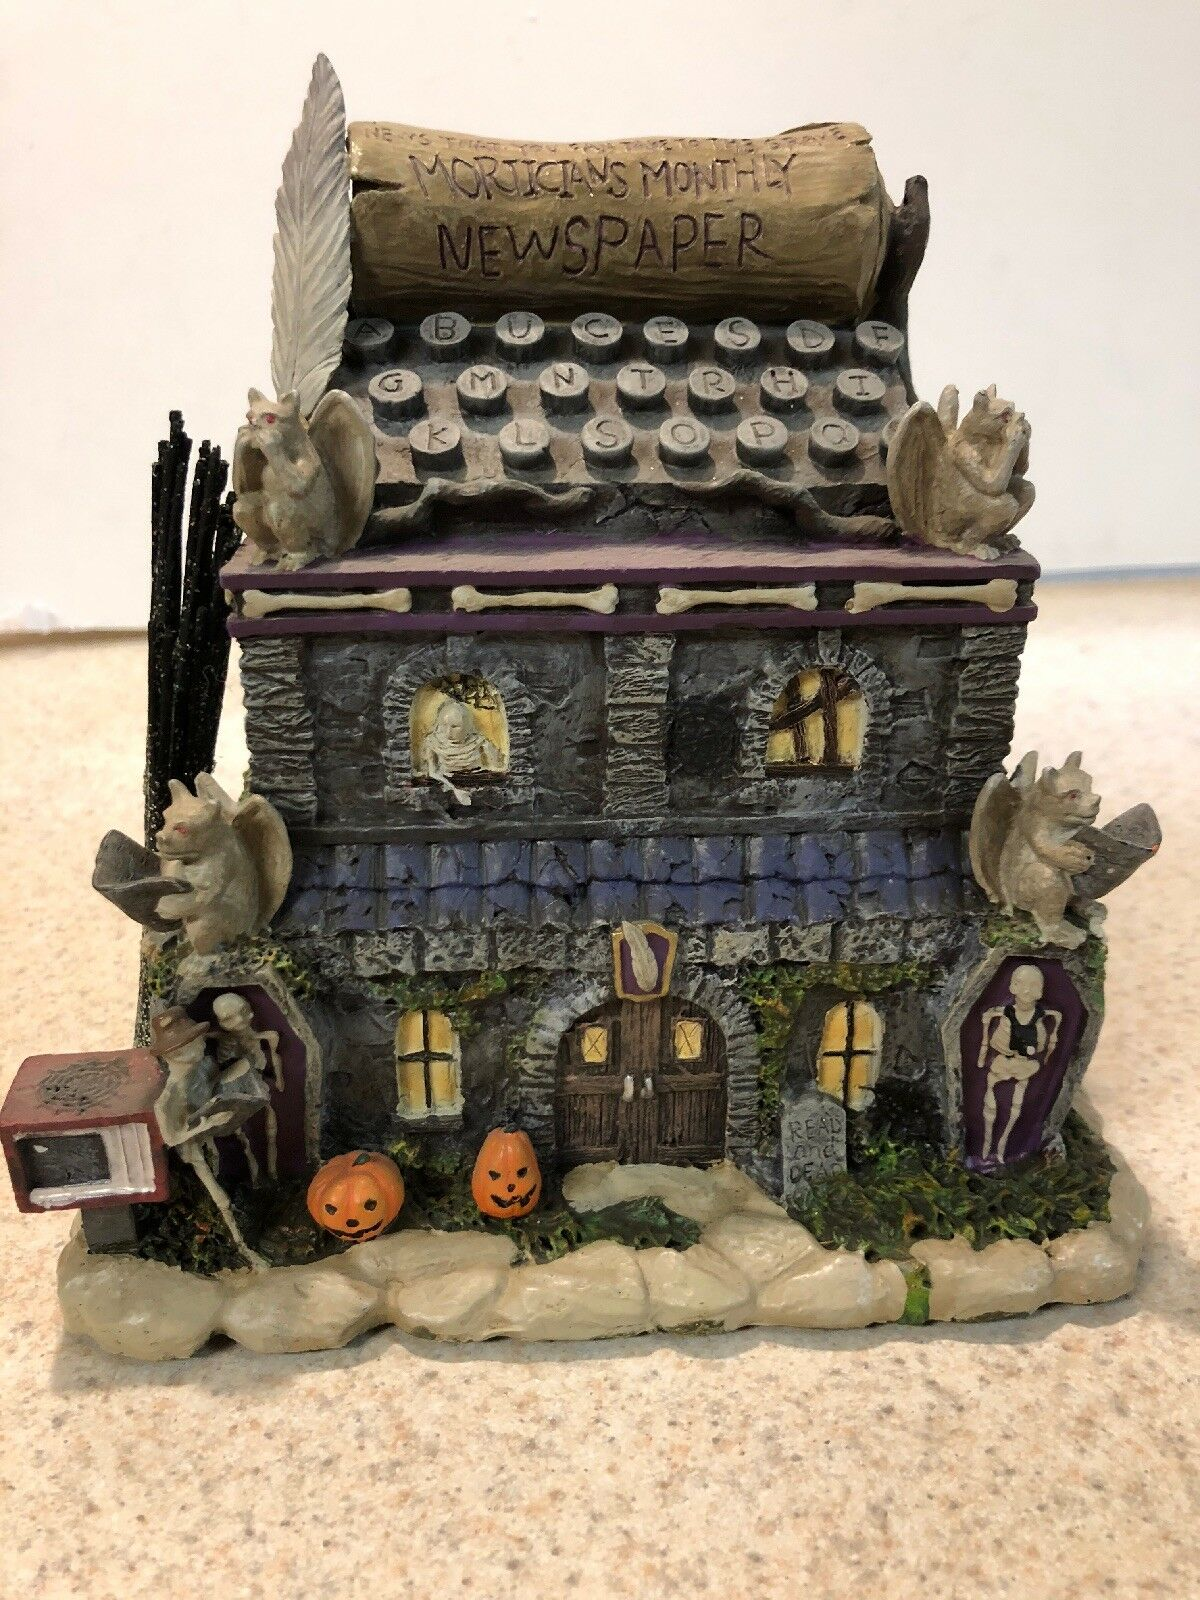 RARE MUNSTERS Morticians Monthly Newspaper HALLOWEEN HAWTHORNE VILLAGE Gargoyle